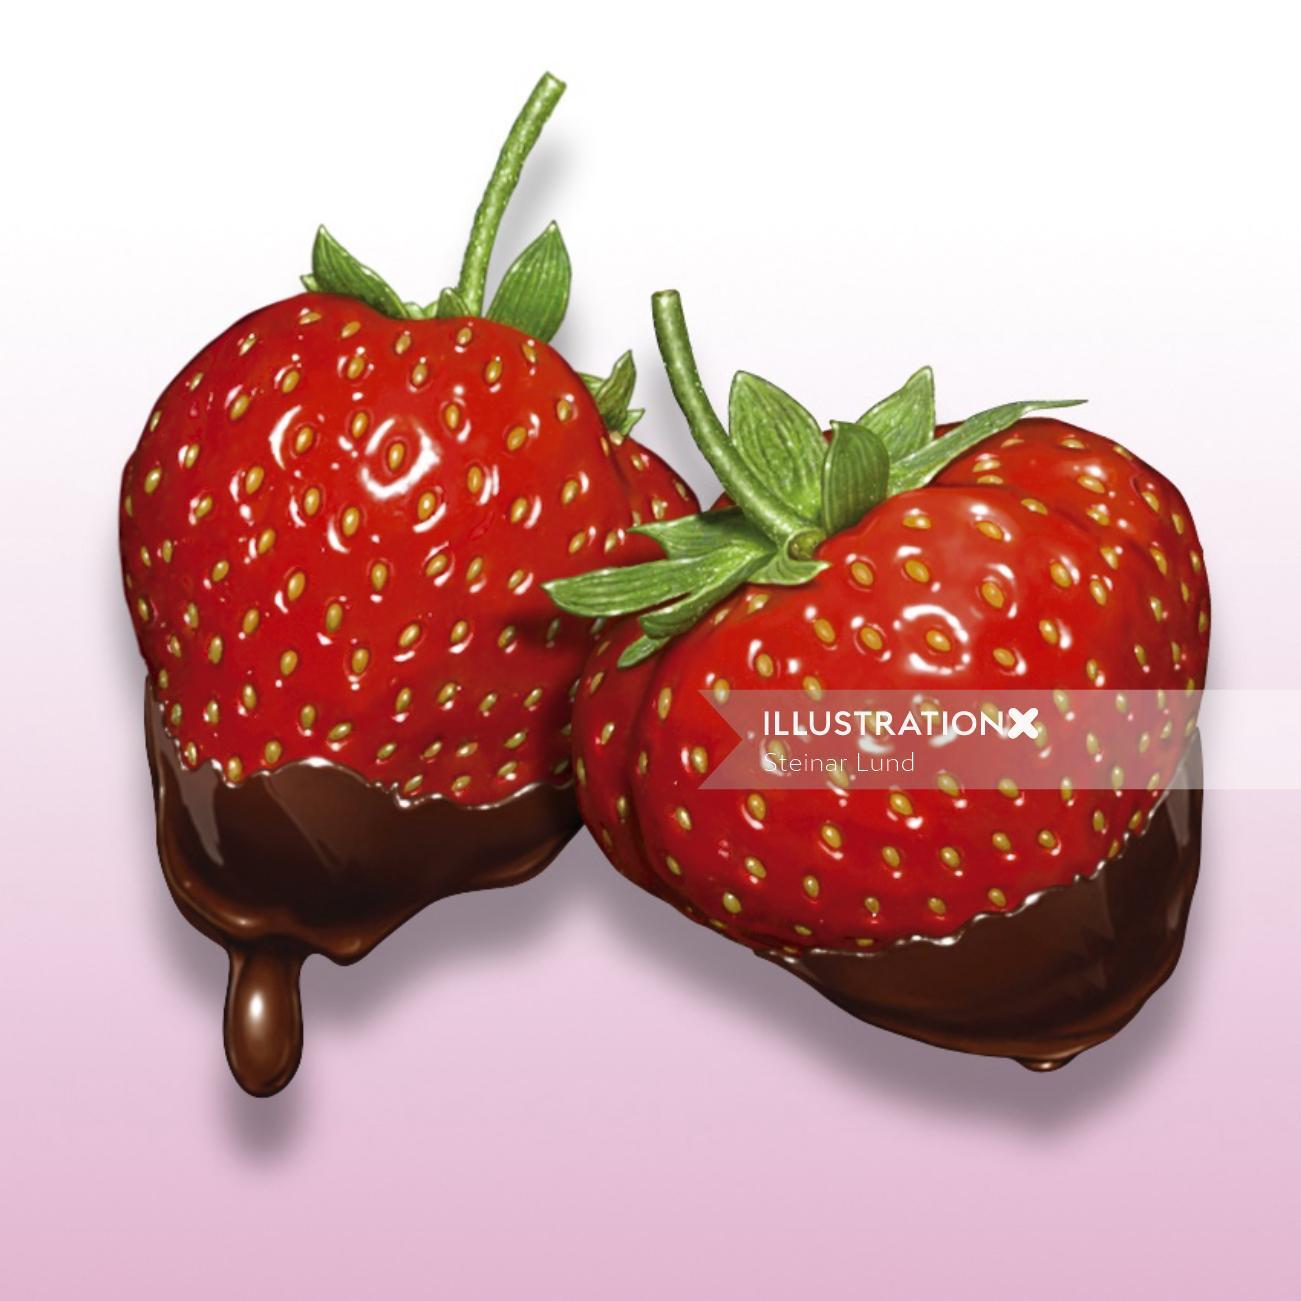 Food illustration of strawberries